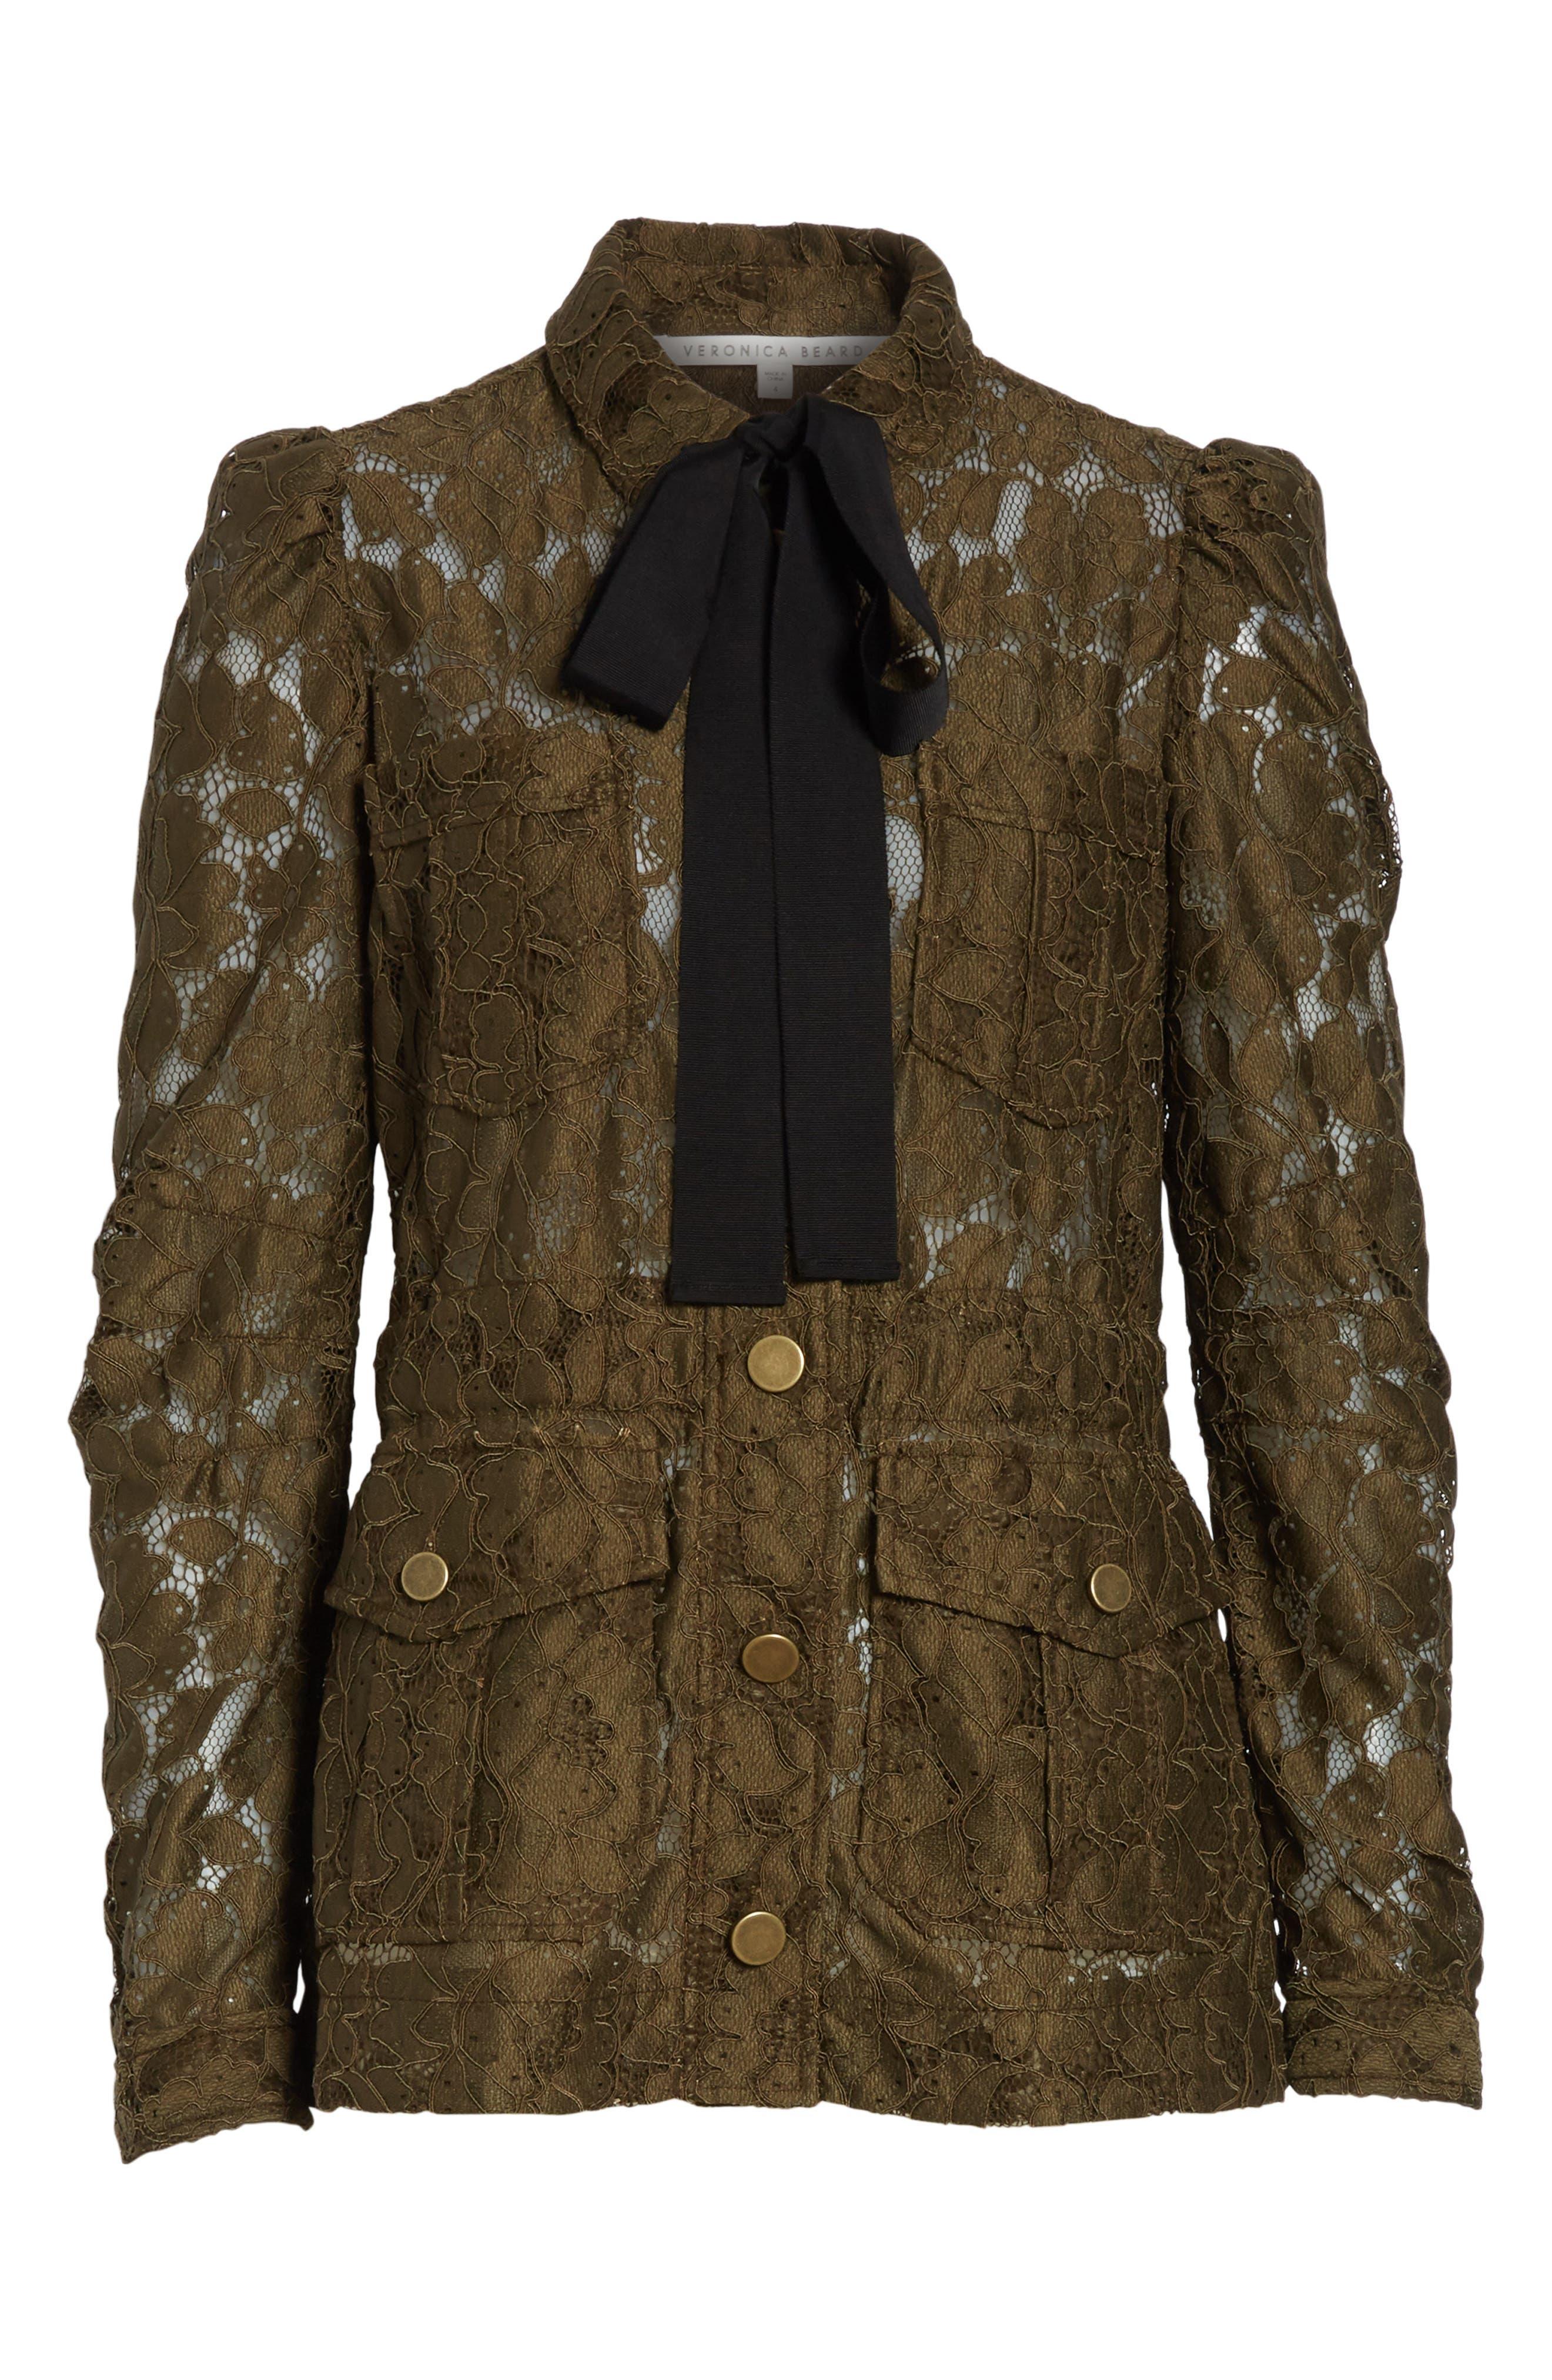 Daniela Tie Neck Lace Army Jacket,                             Alternate thumbnail 5, color,                             310